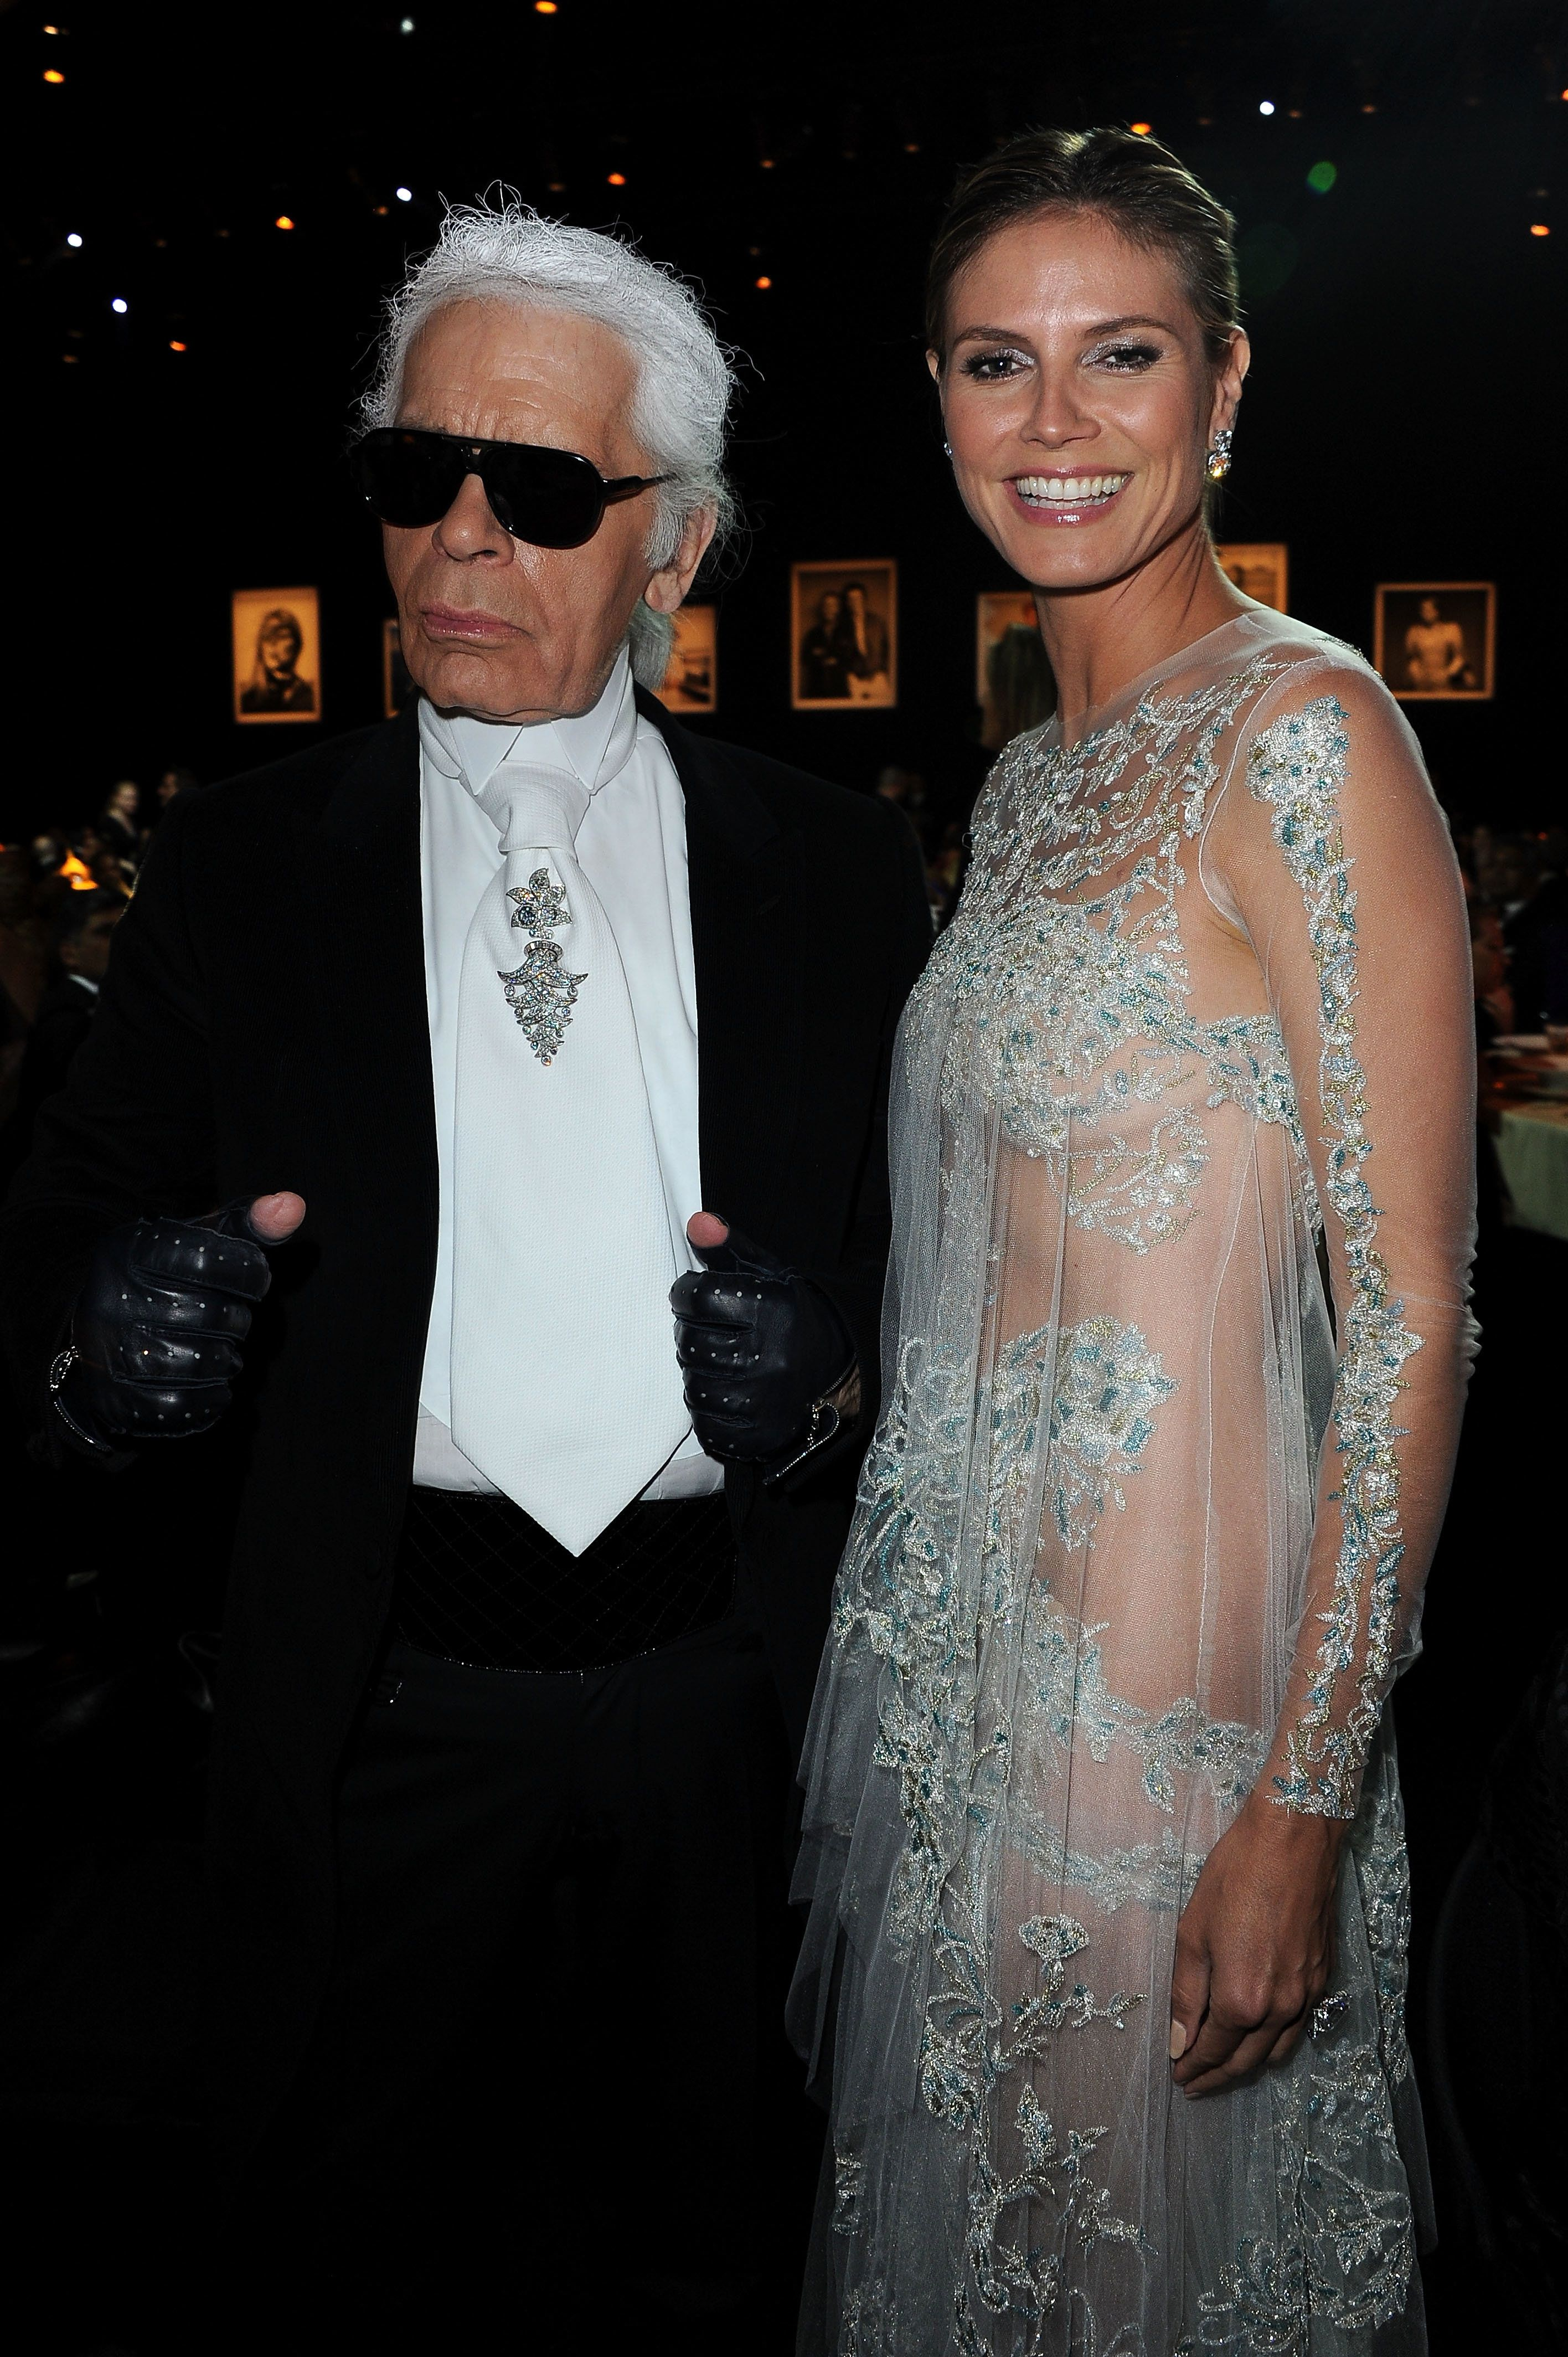 Here's Why People Are Debating Karl Lagerfeld's